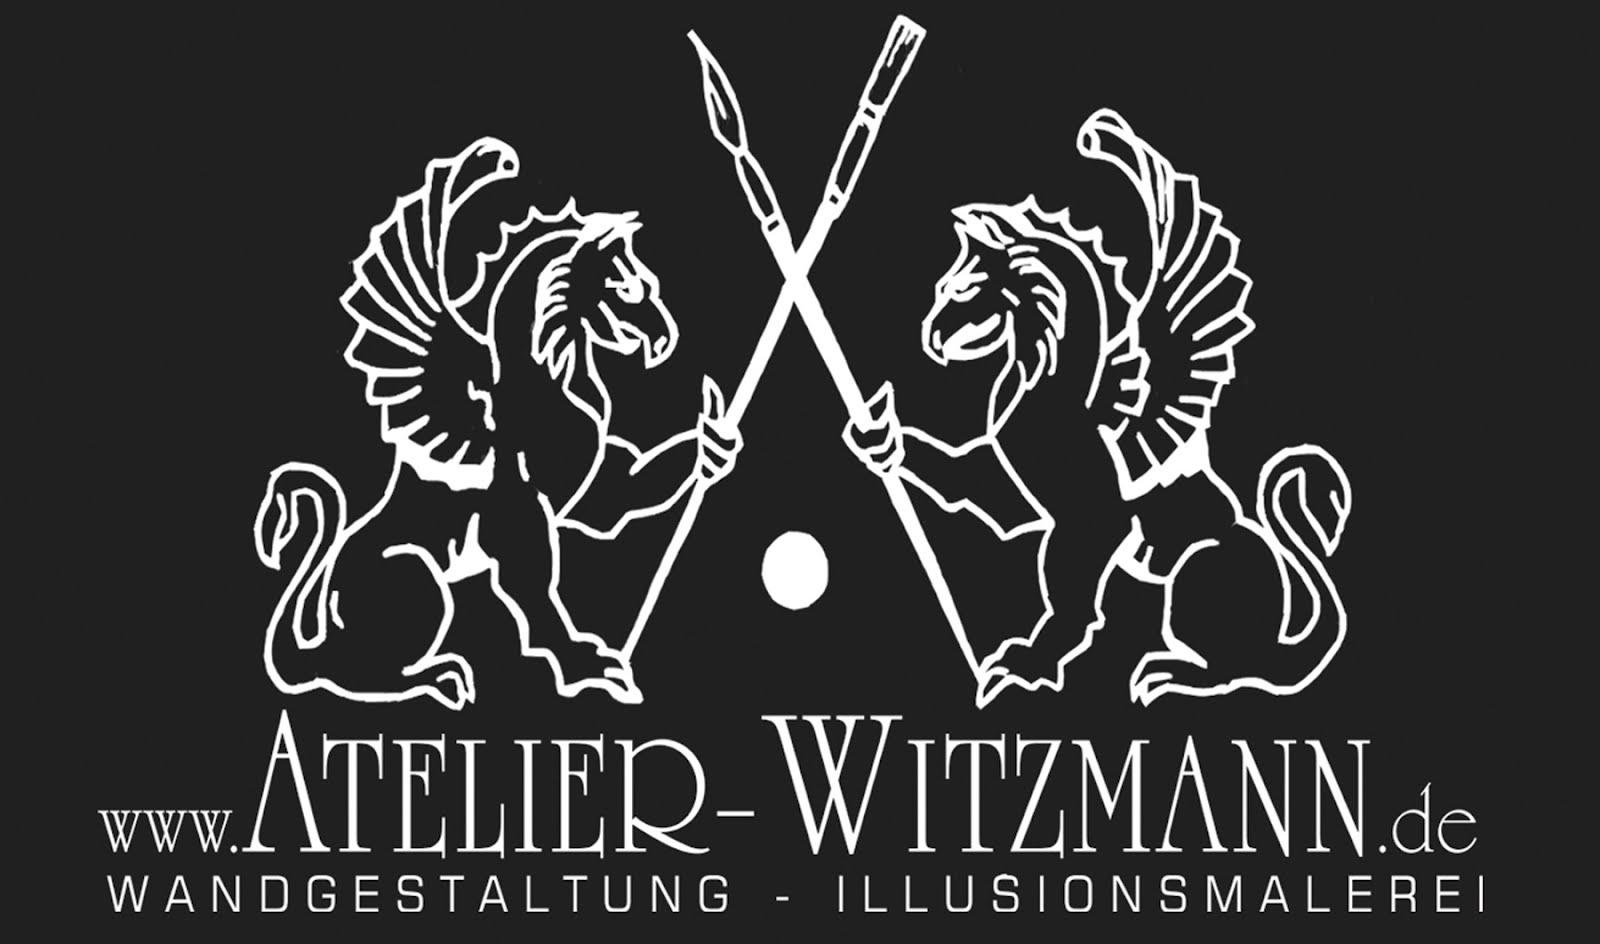 Atelier Witzmann